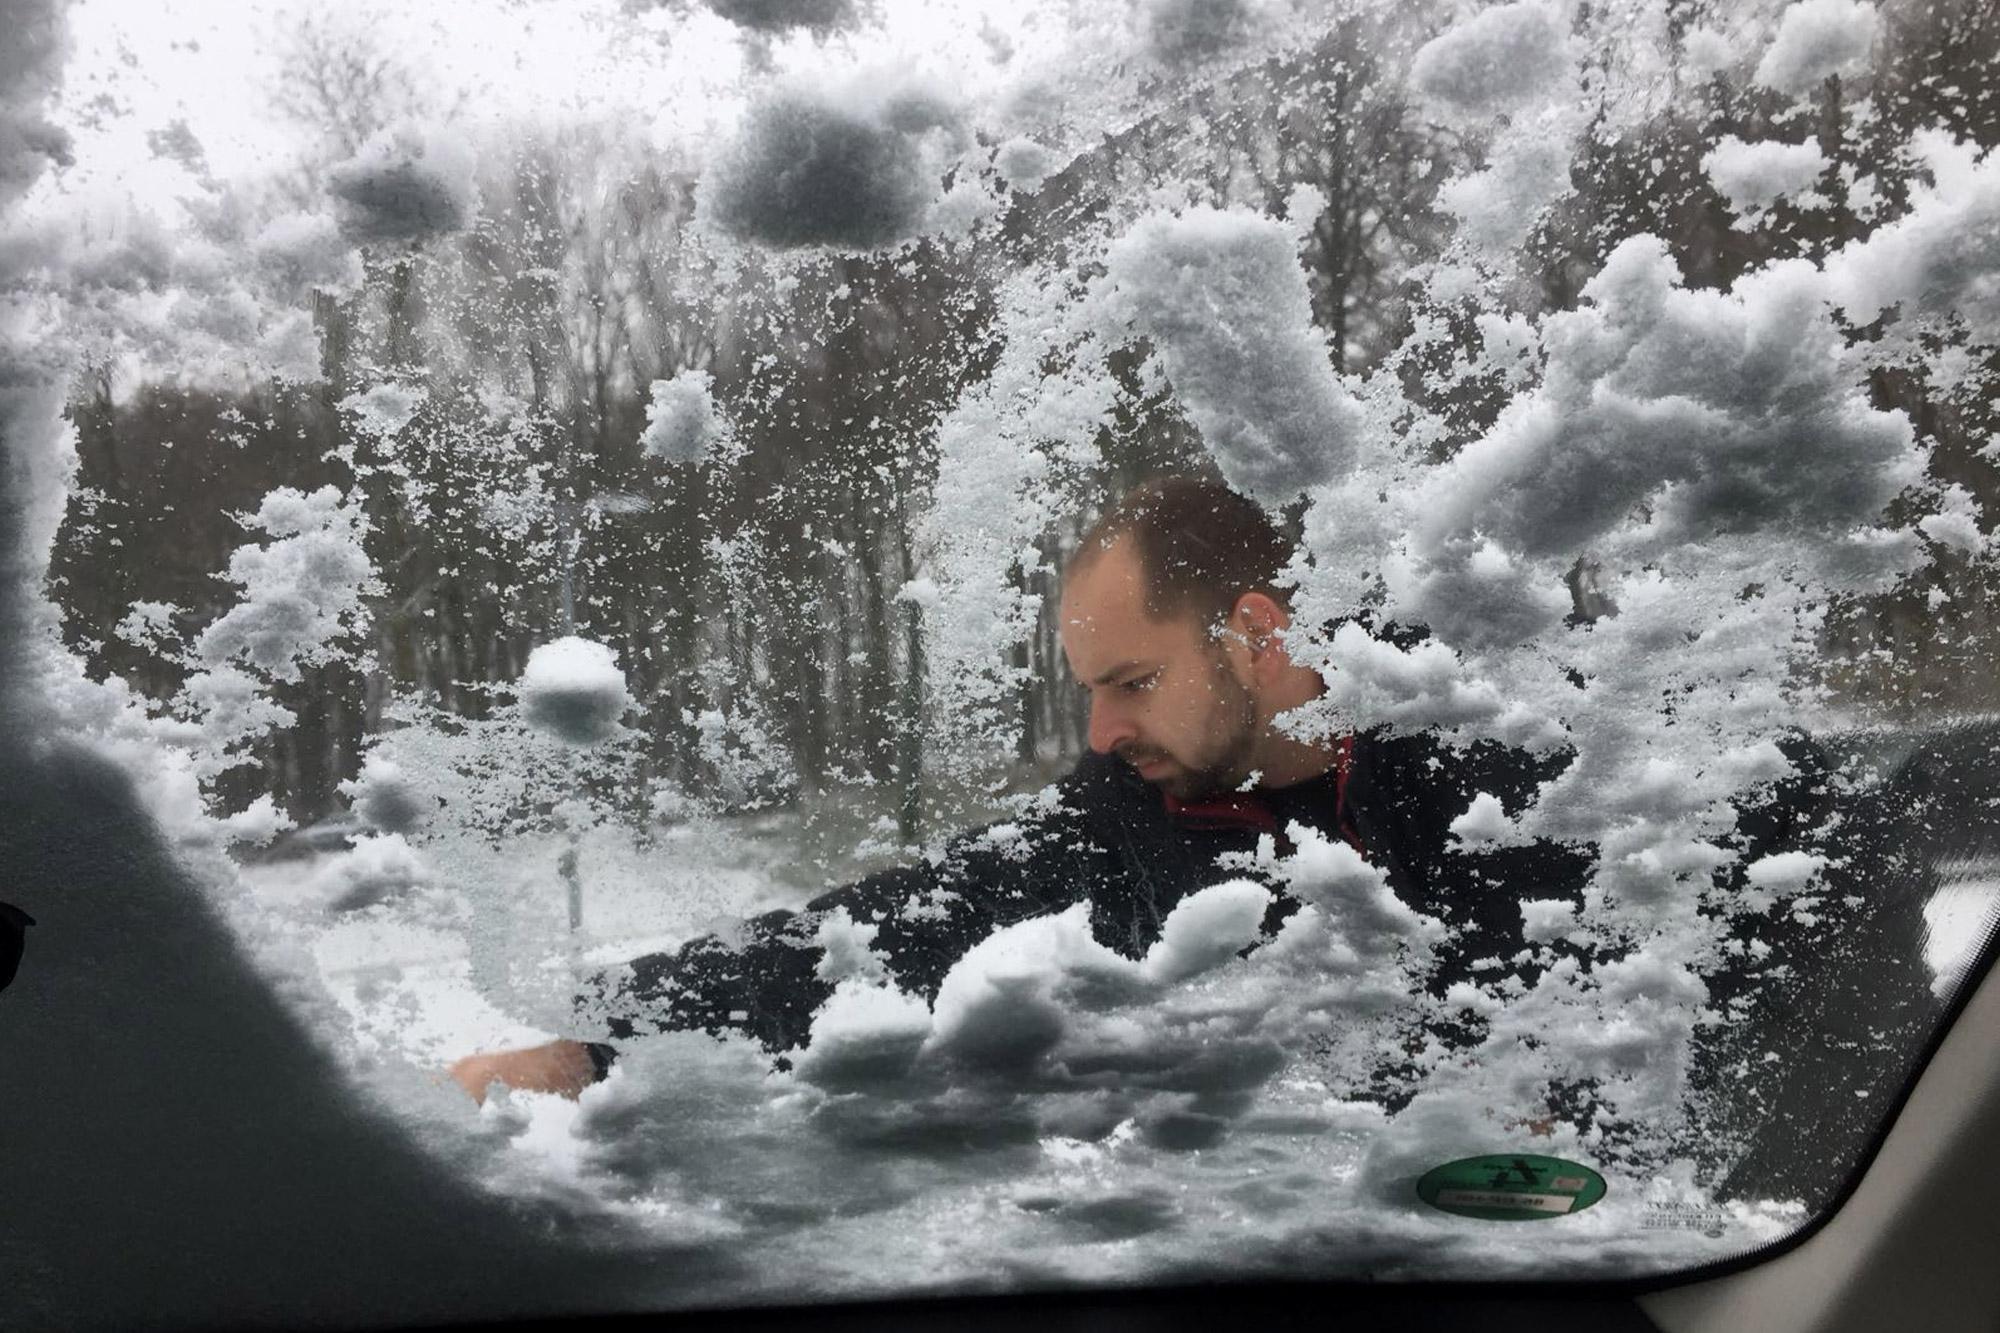 Bielefeld - Sneeuw